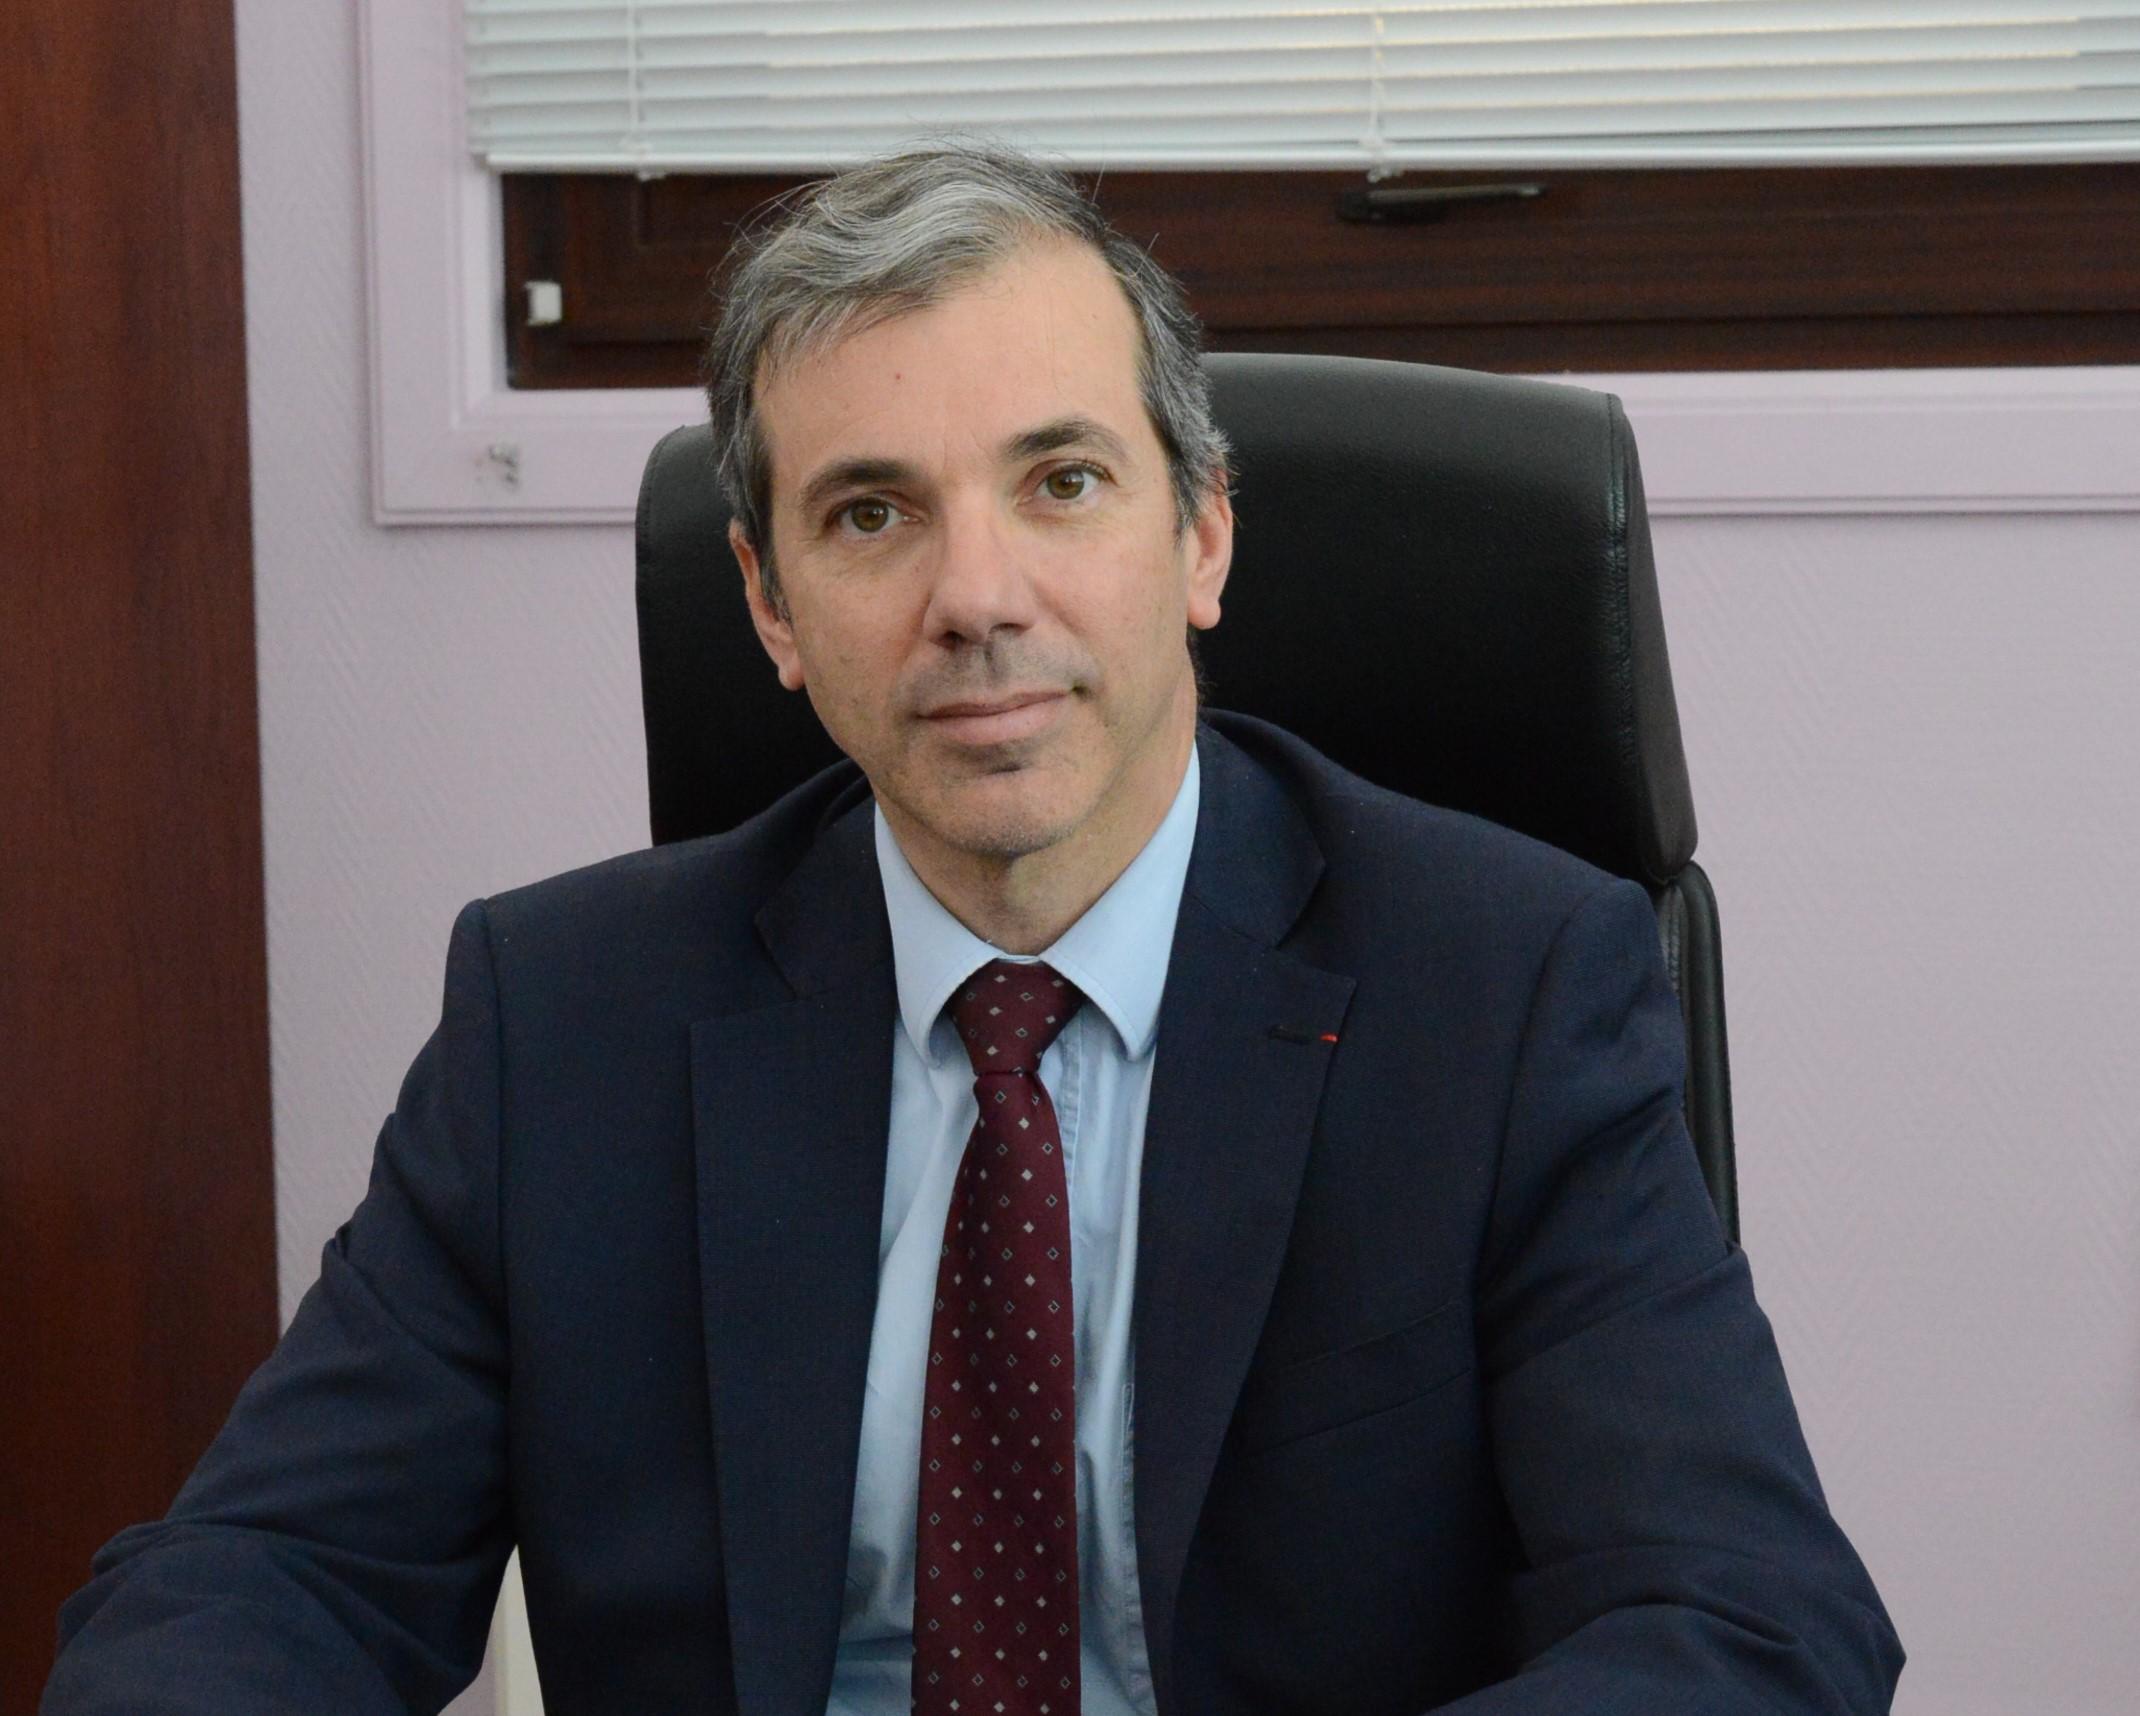 Pierre Carlotti, Artelia Bâtimement